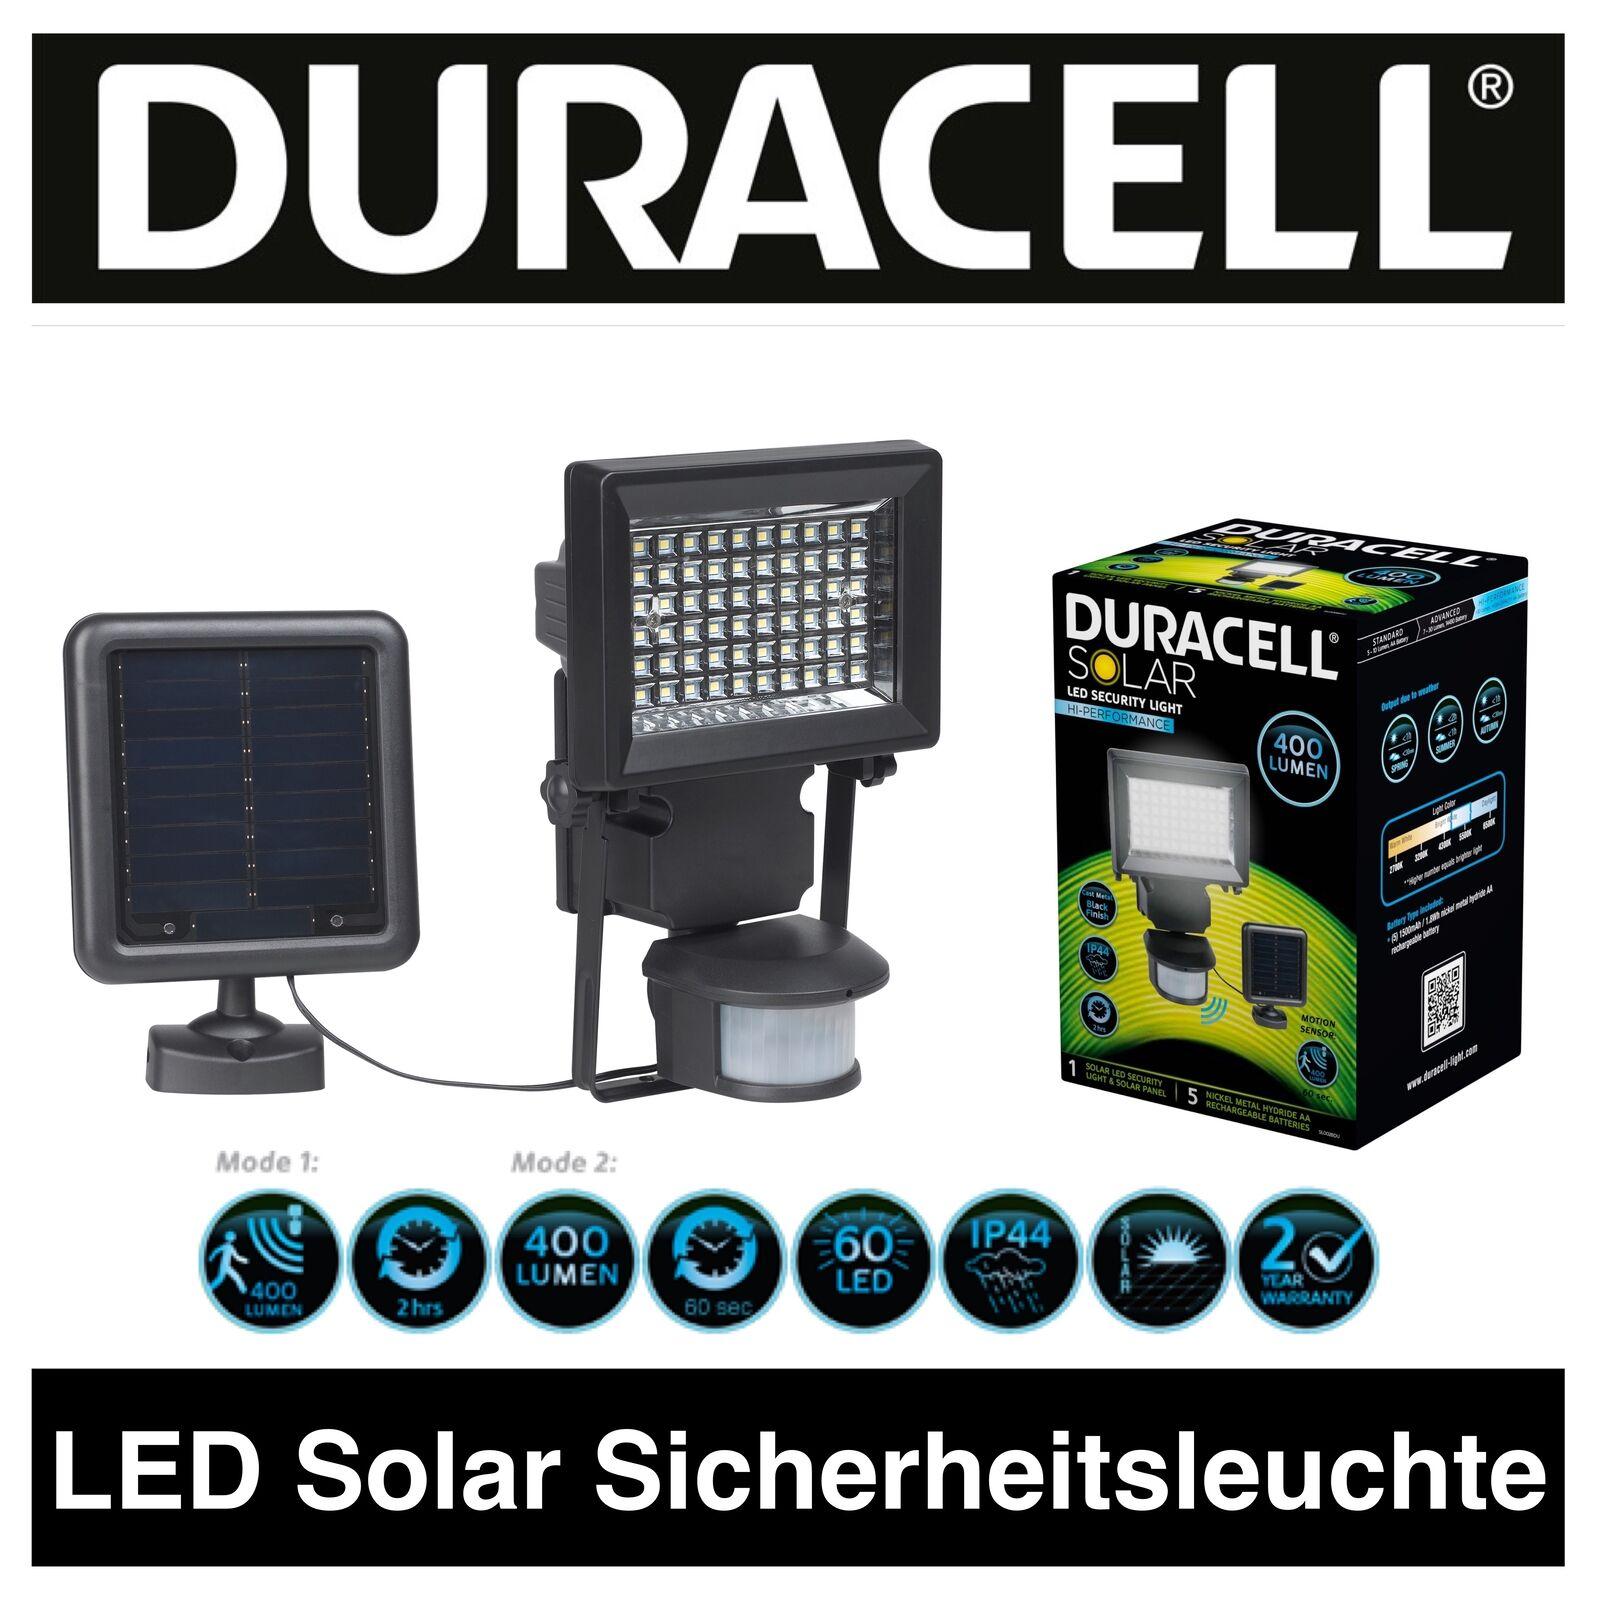 Duracell LED solar lámpara de seguridad casa lámpara con externo panel solar 400lm